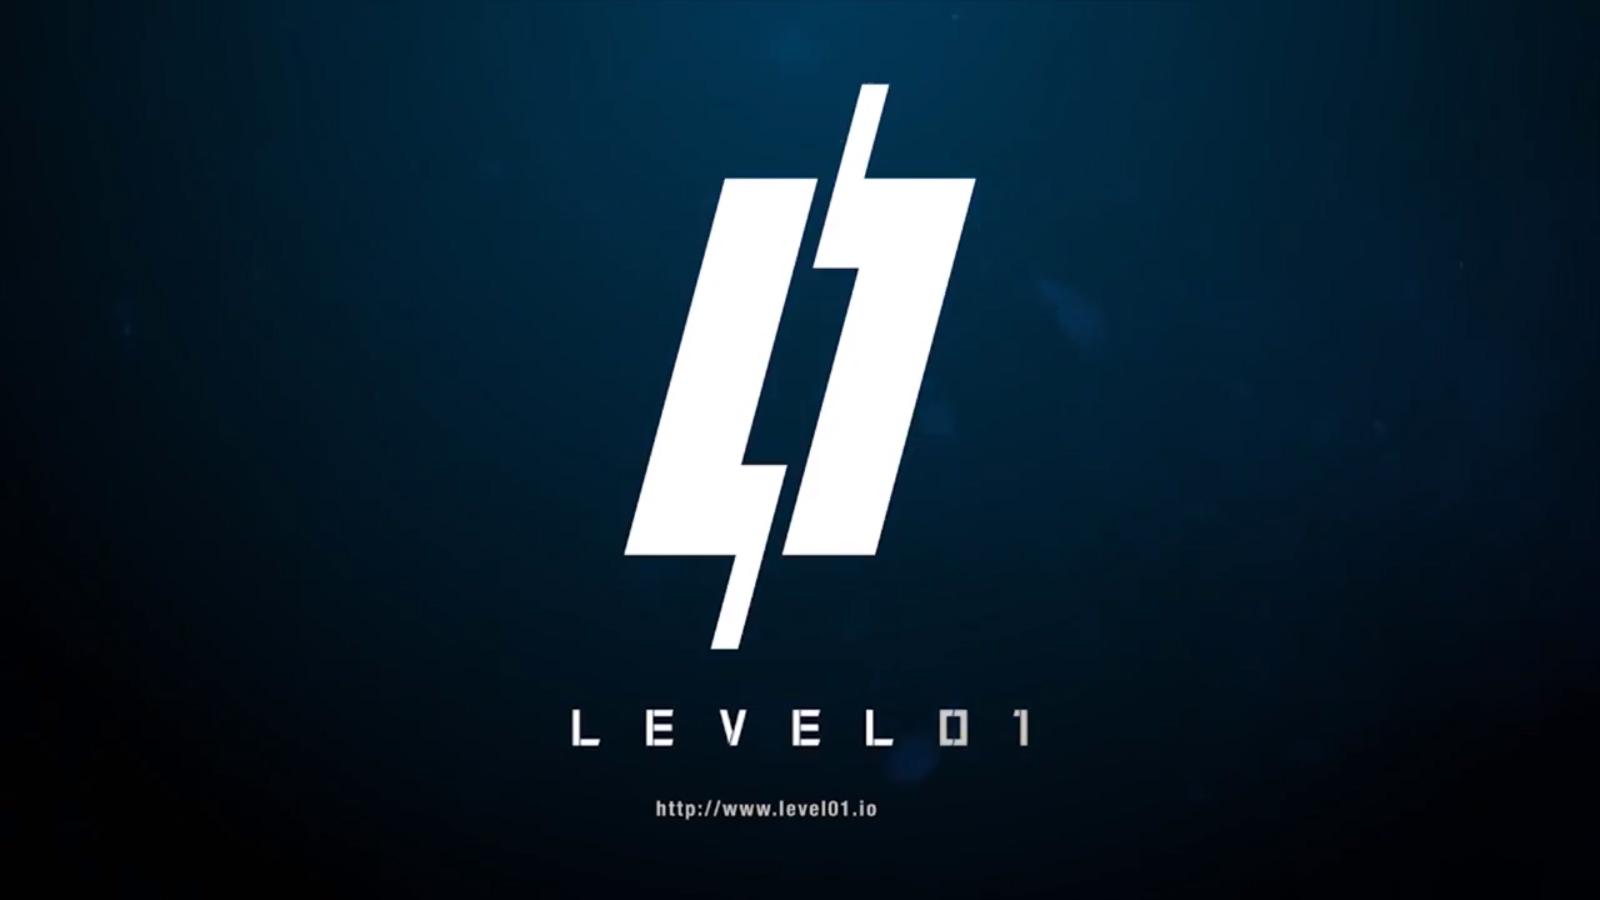 Level011